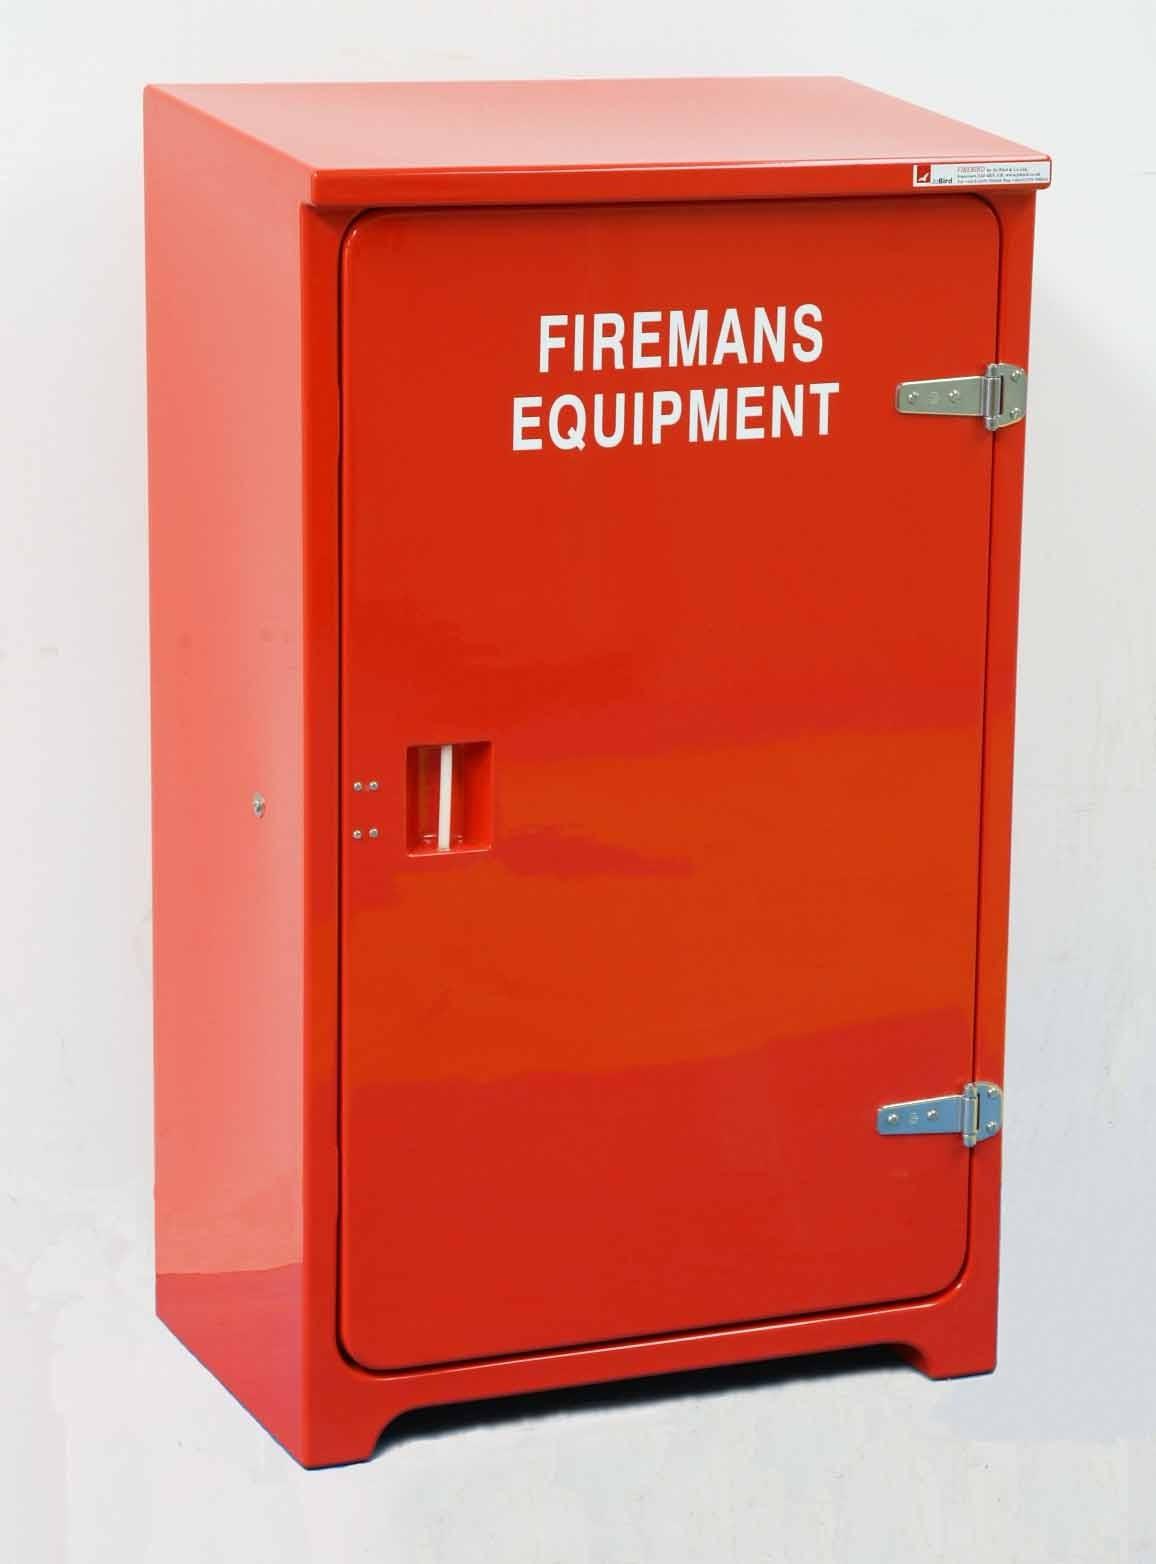 Fire Equipment Cabinet Jb10h Grp Fire Equipment Cabinet Flameskill